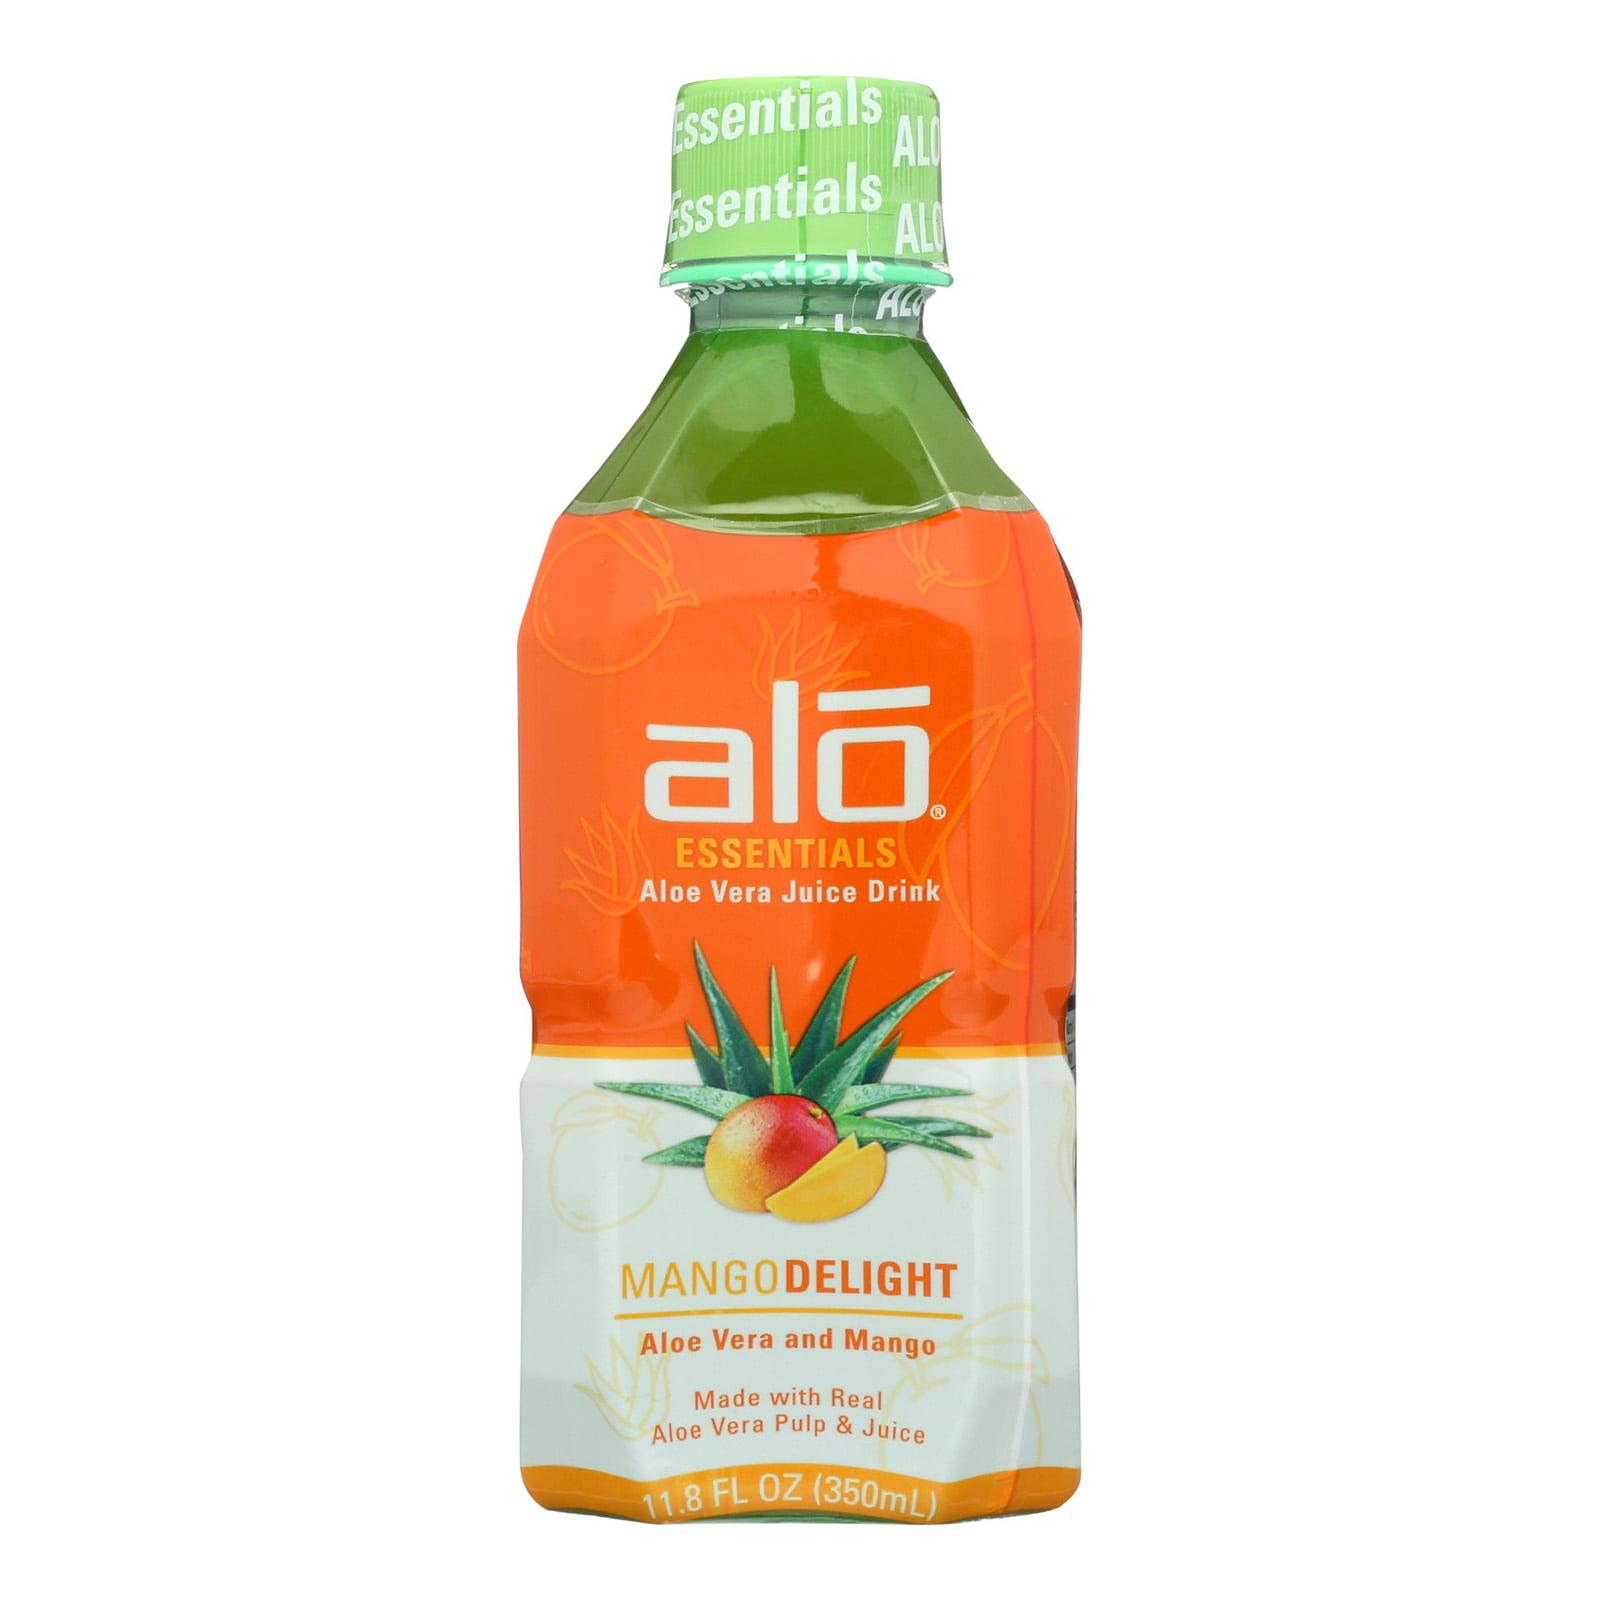 Alo Essentials Mango Delight, 11.8 FL OZ